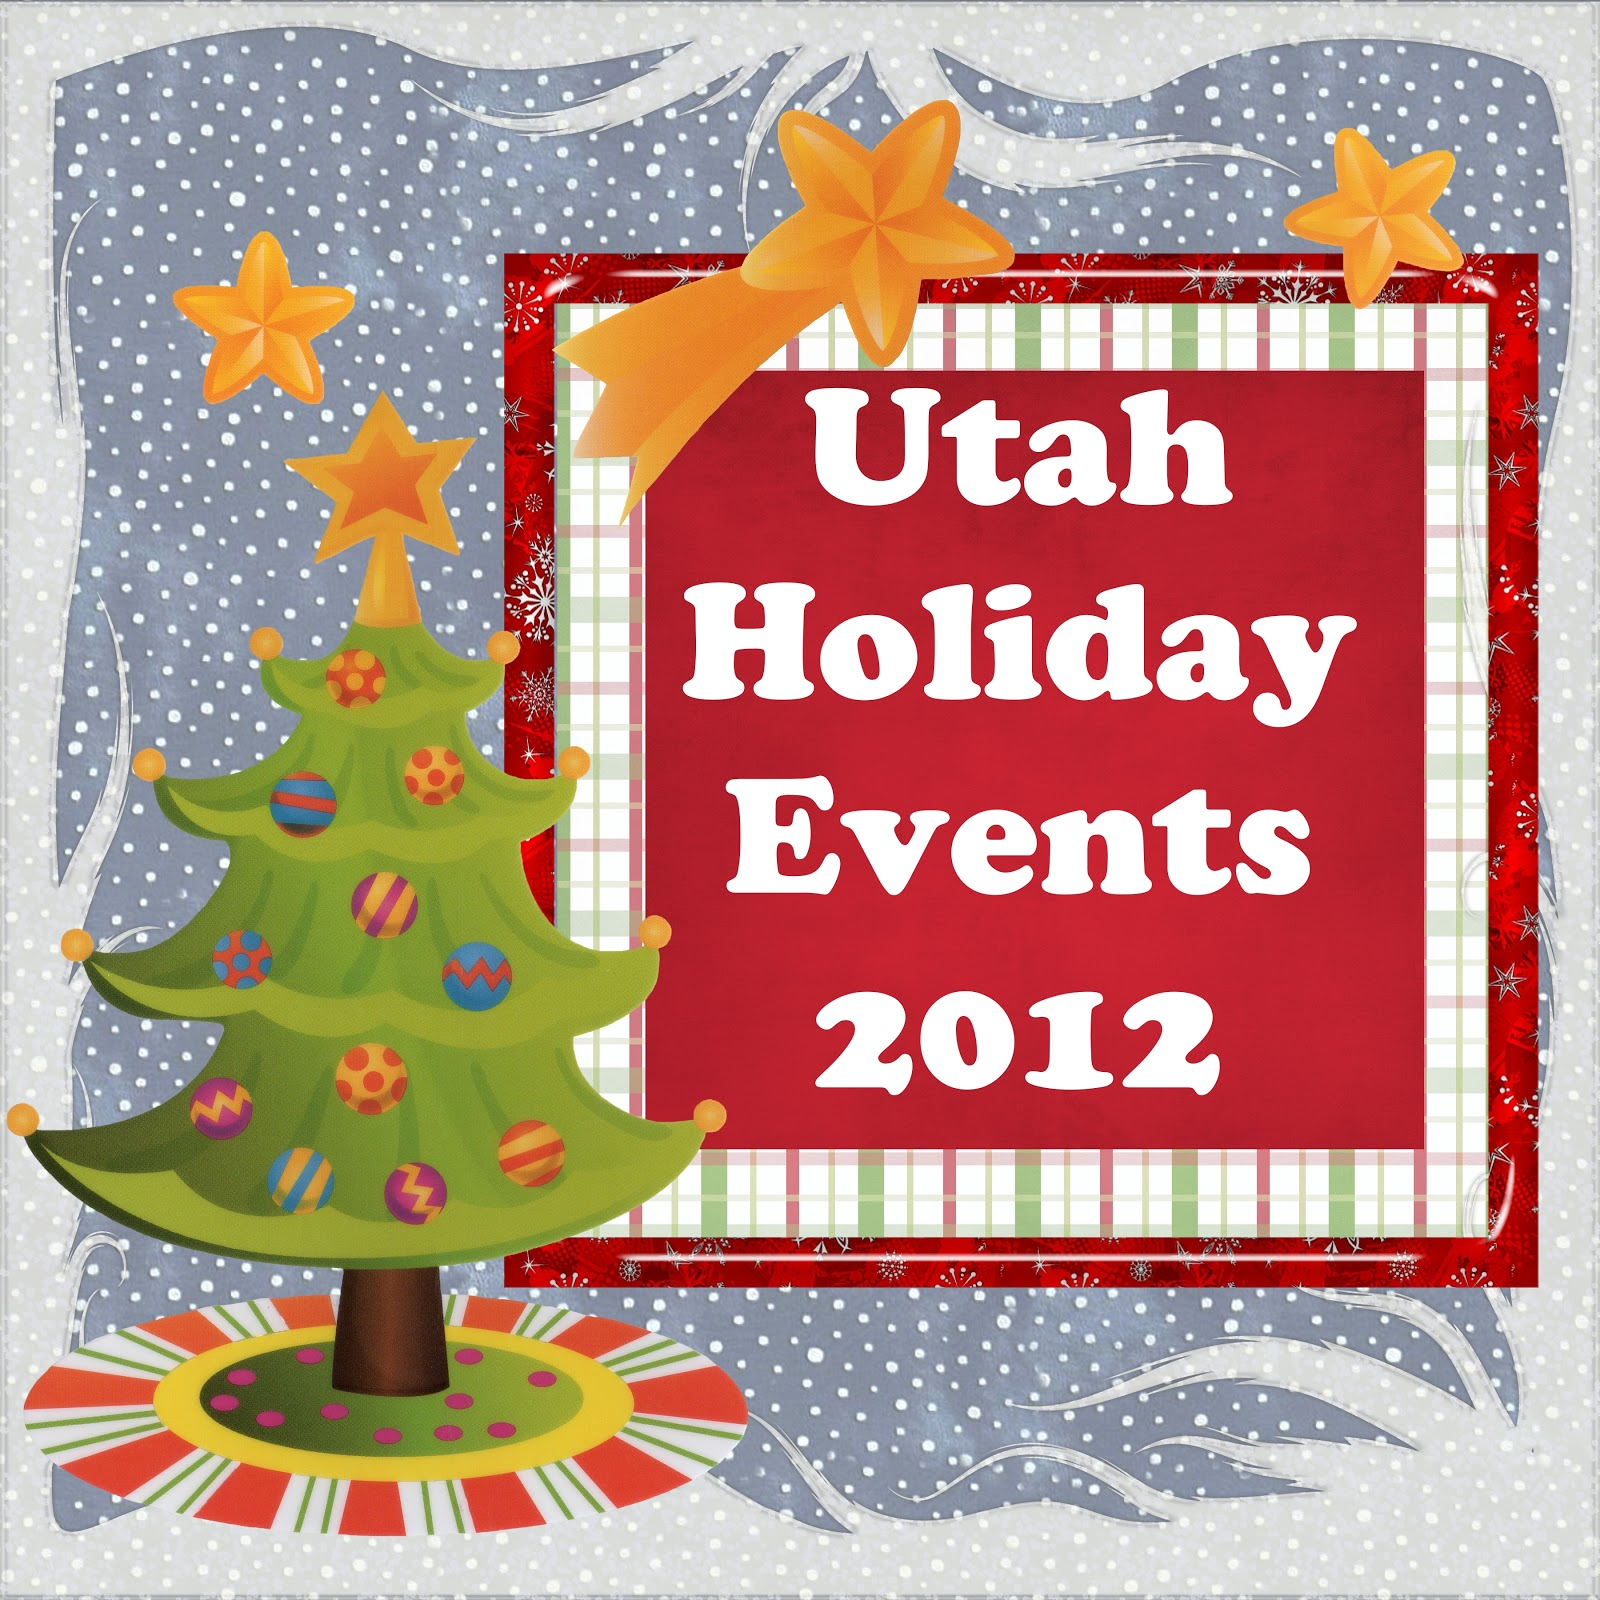 Enjoy Utah!: Utah Holiday Events 2012